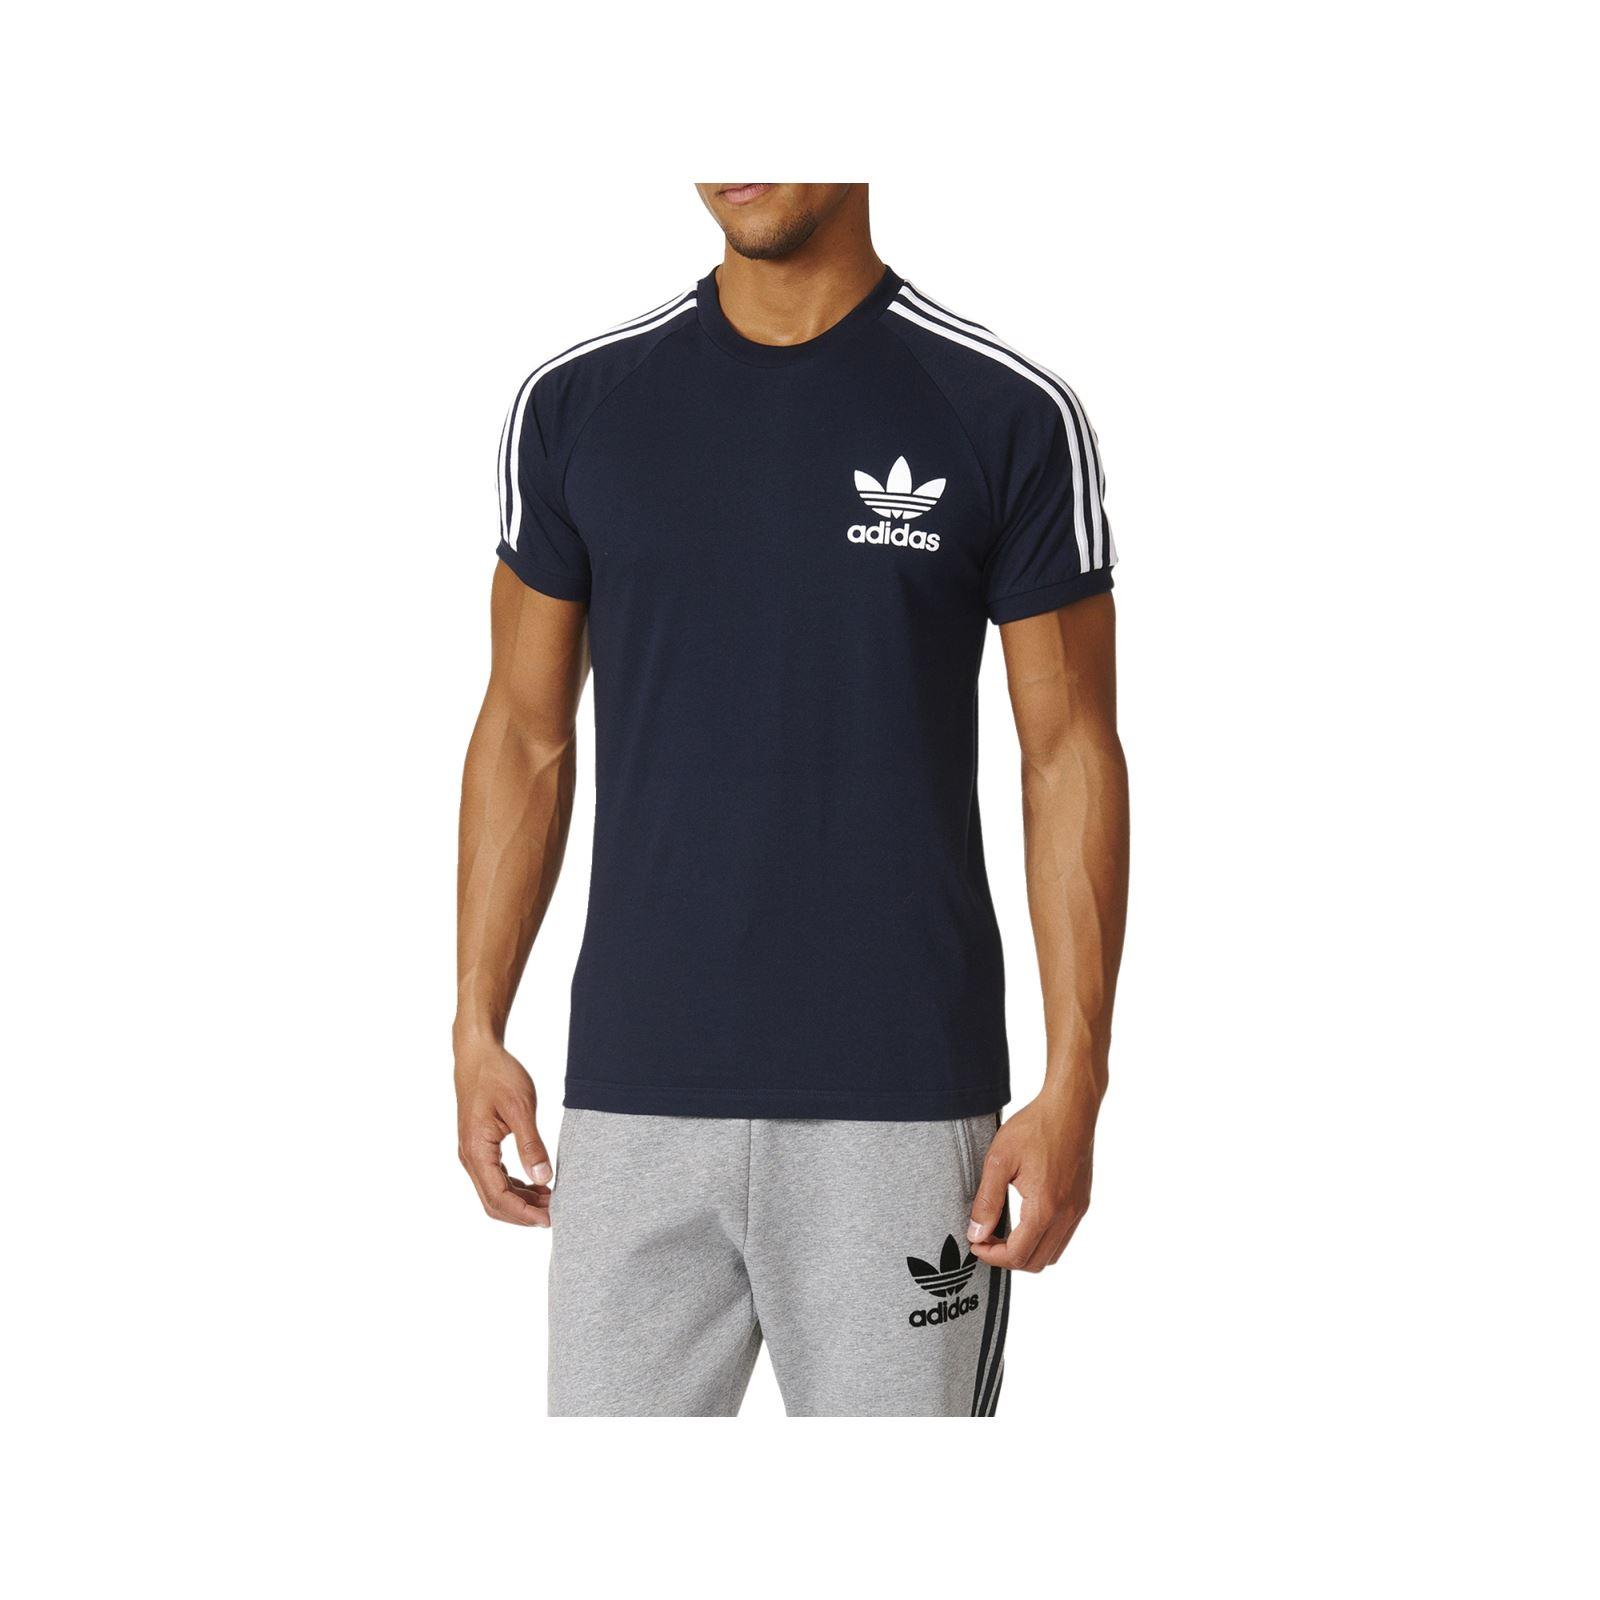 adidas original tee shirt,T Shirts Adidas Originals T